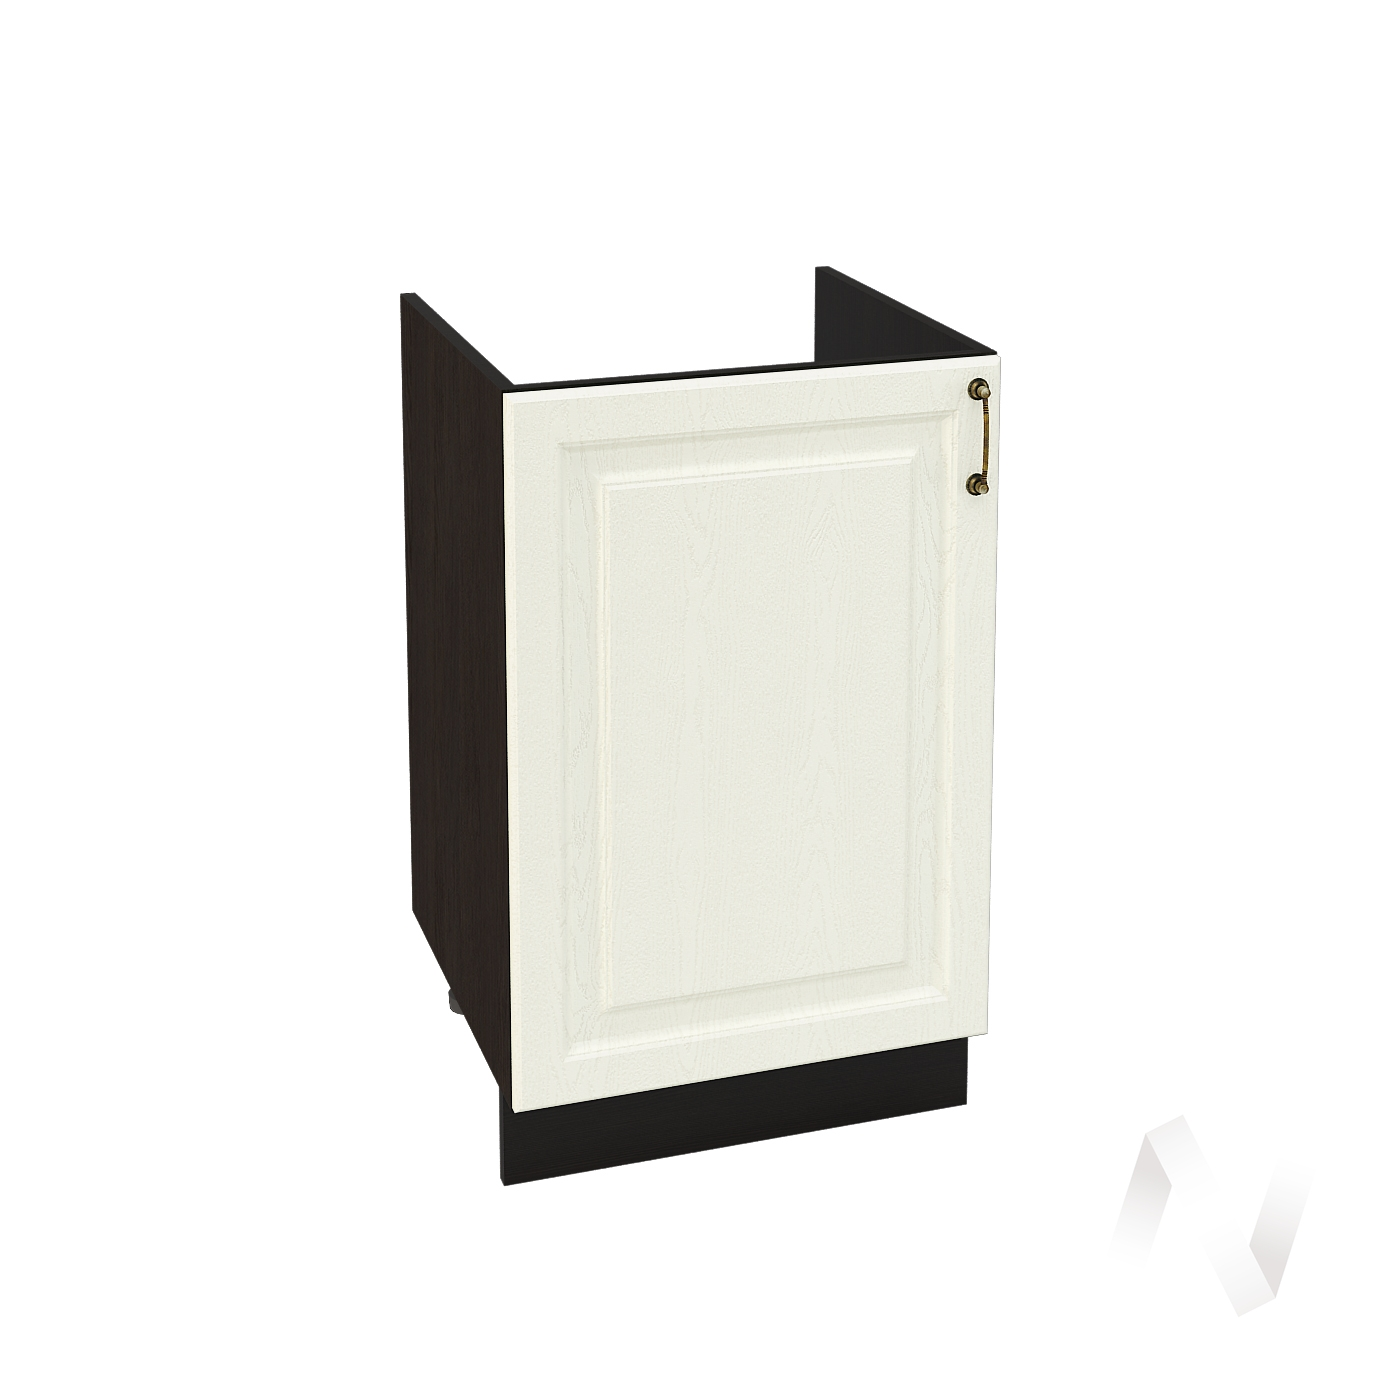 "Кухня ""Ницца"": Шкаф нижний под мойку 500, ШНМ 500 (Крем/корпус венге)"